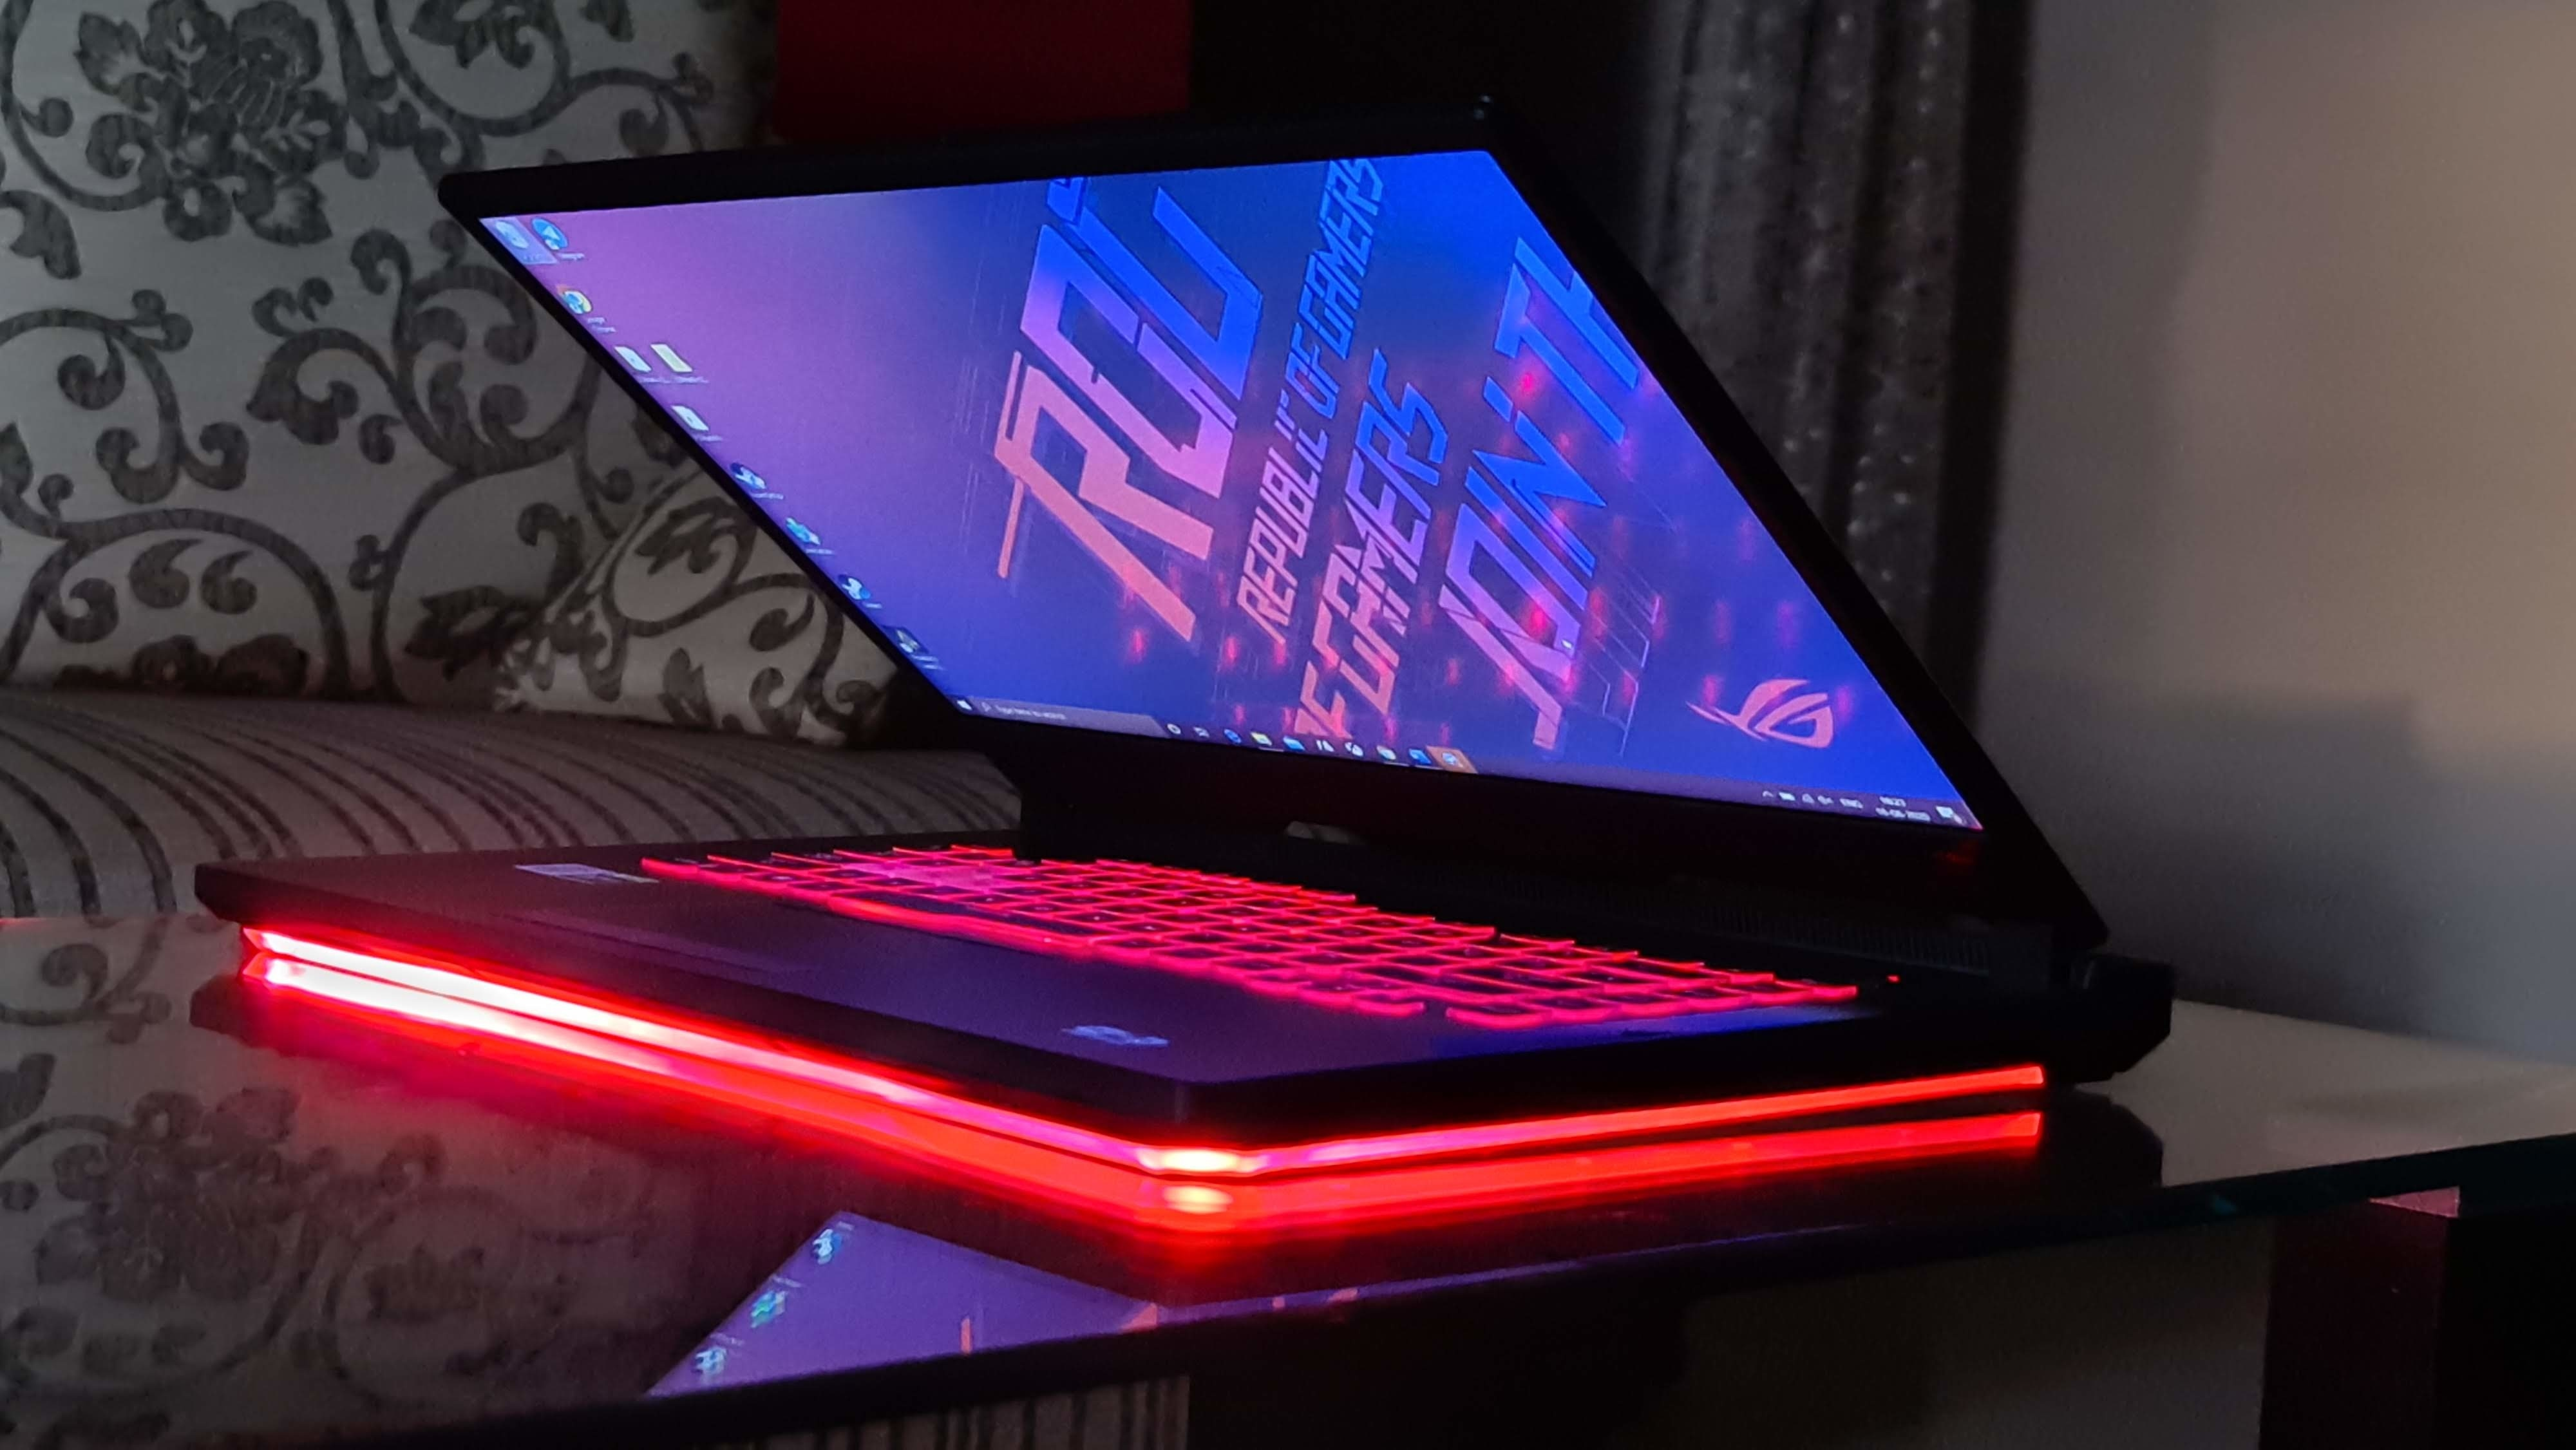 The ROG Strix G512LI screen also has 100% RGB colour gamut.